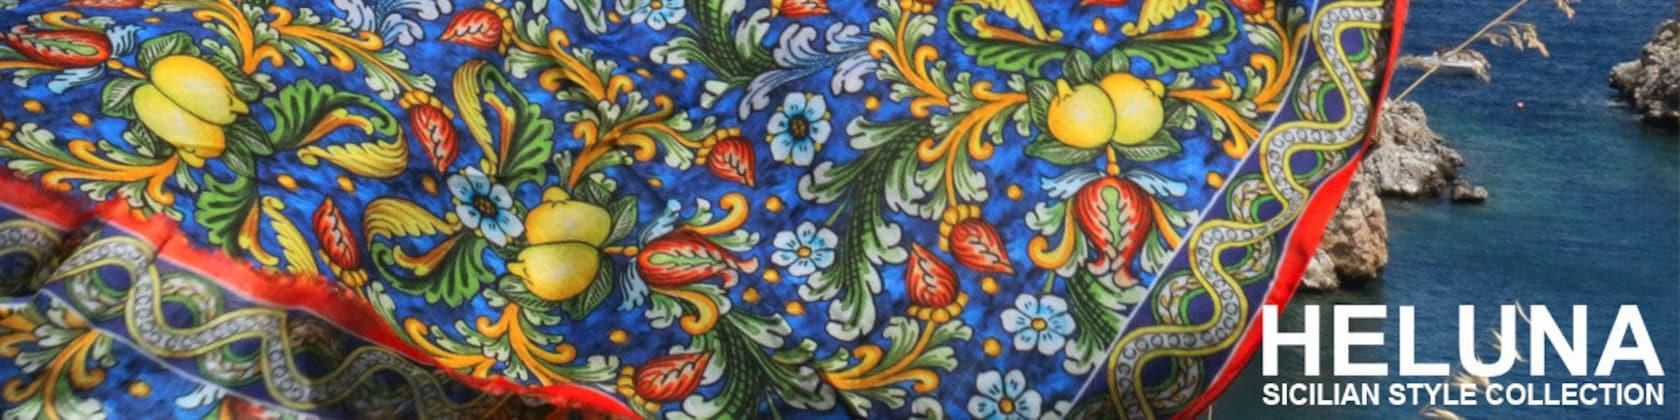 Heluna fashion   jewelry by HELUNArt on Etsy f0053b57efd